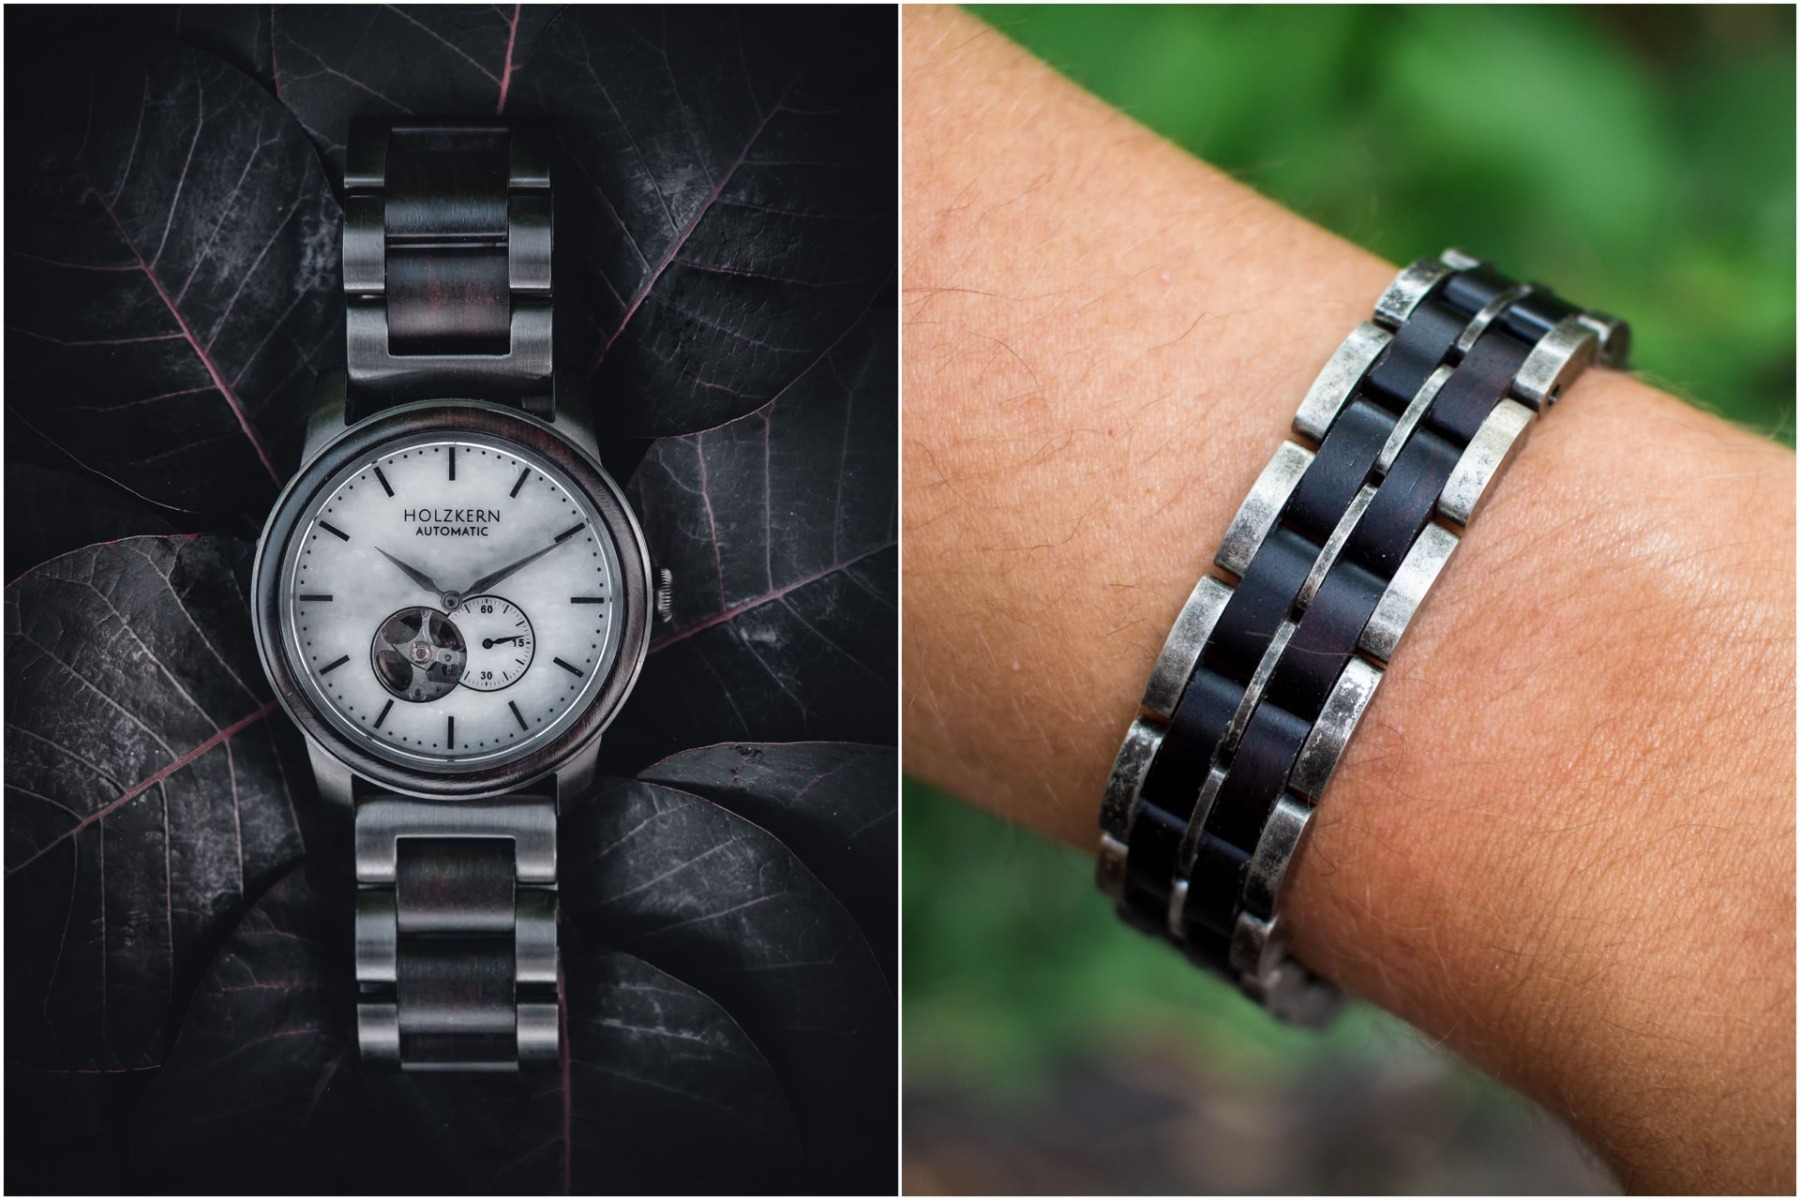 Bracelets from Holzkern